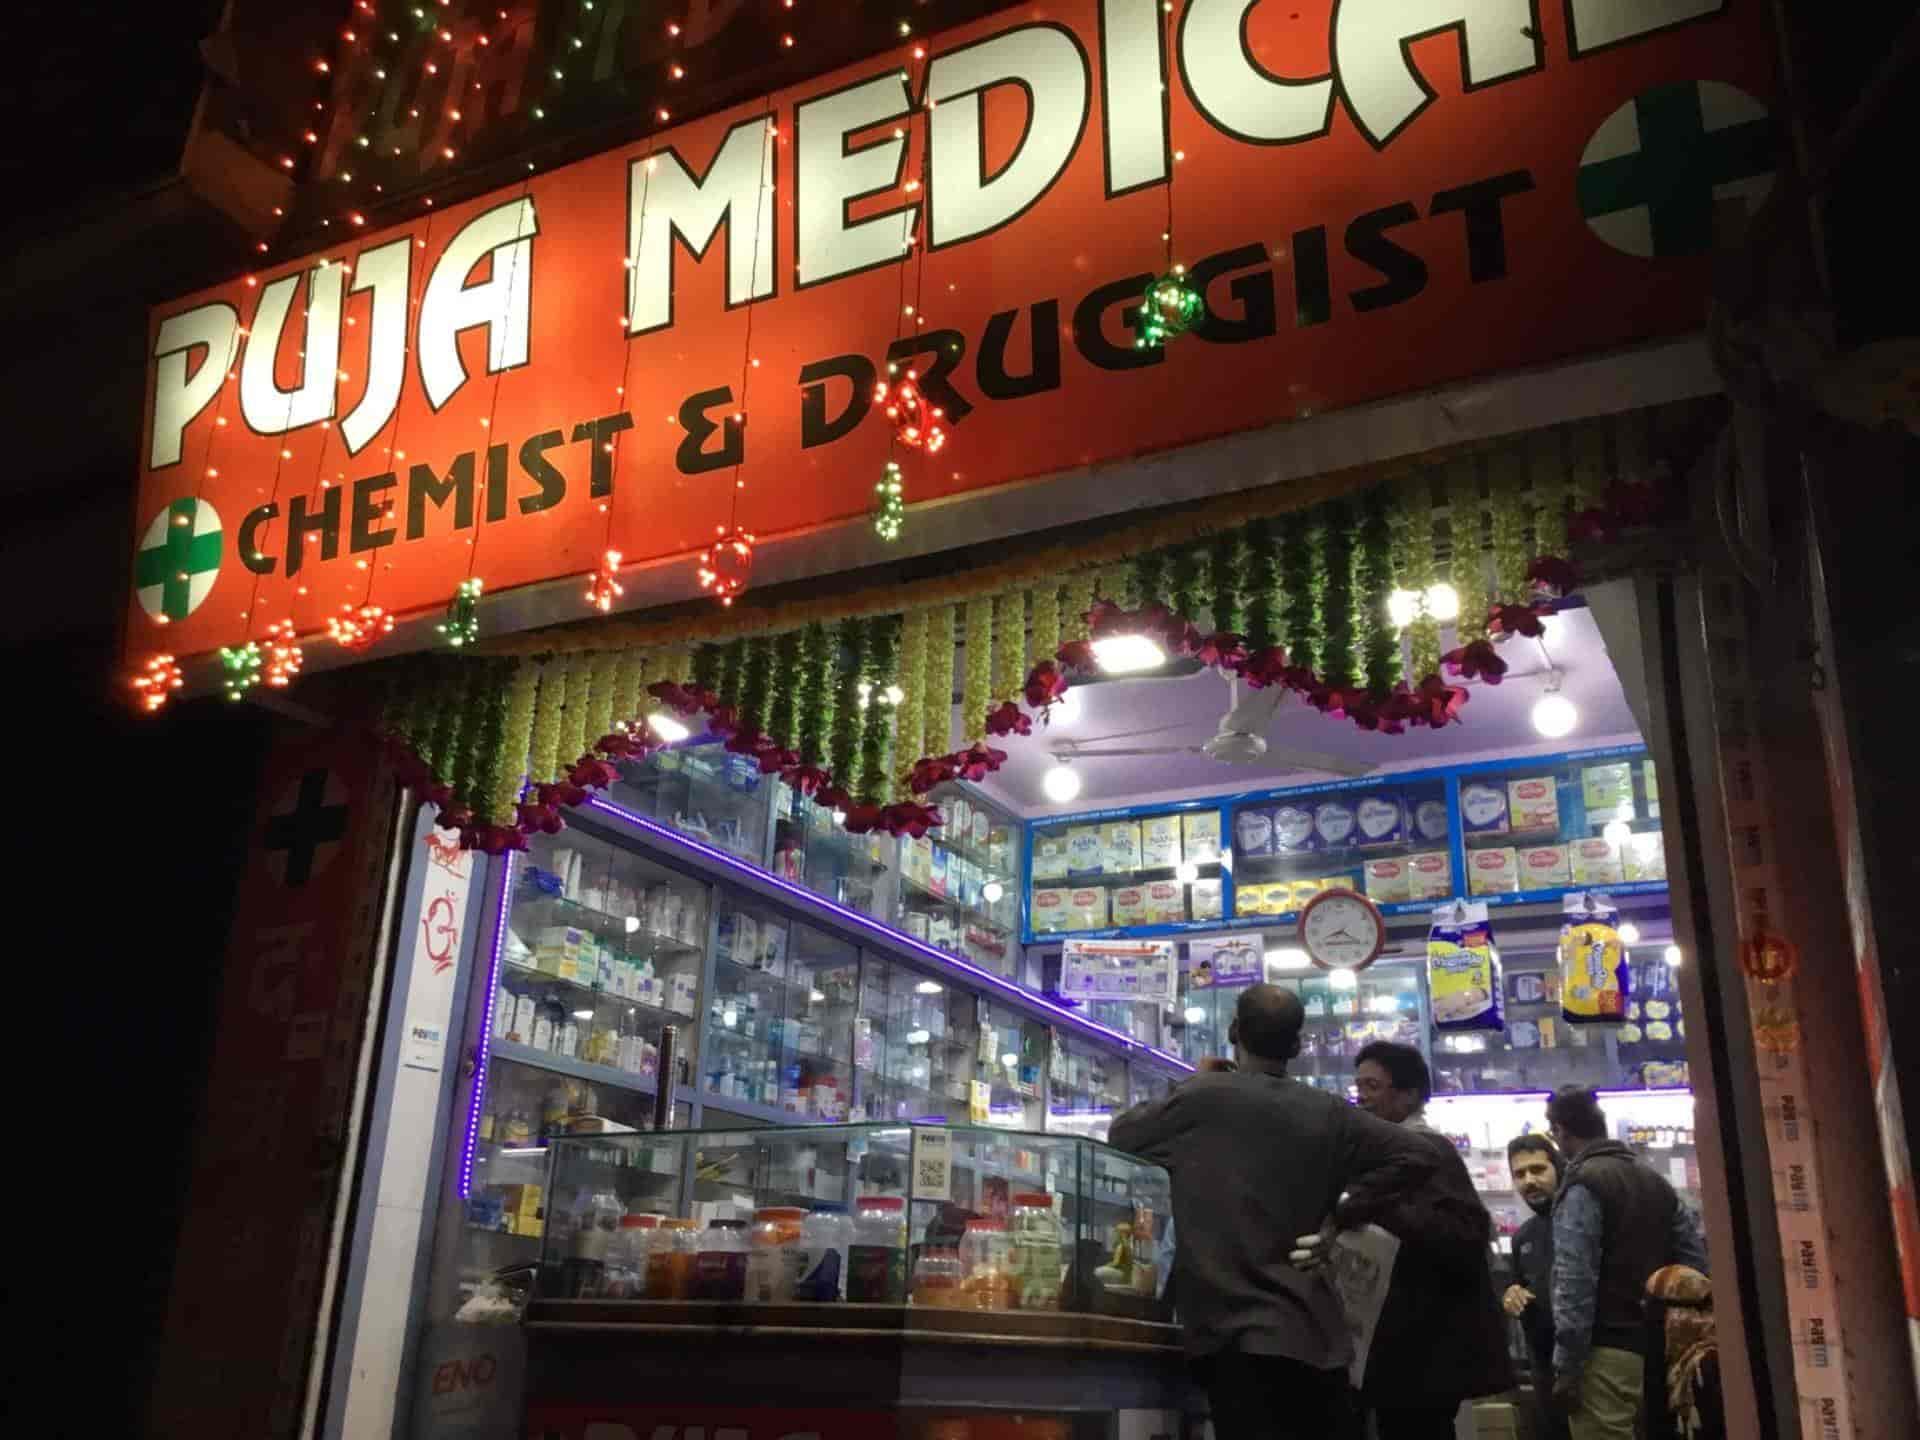 Puja Medical, Mango - Chemists in Jamshedpur - Justdial